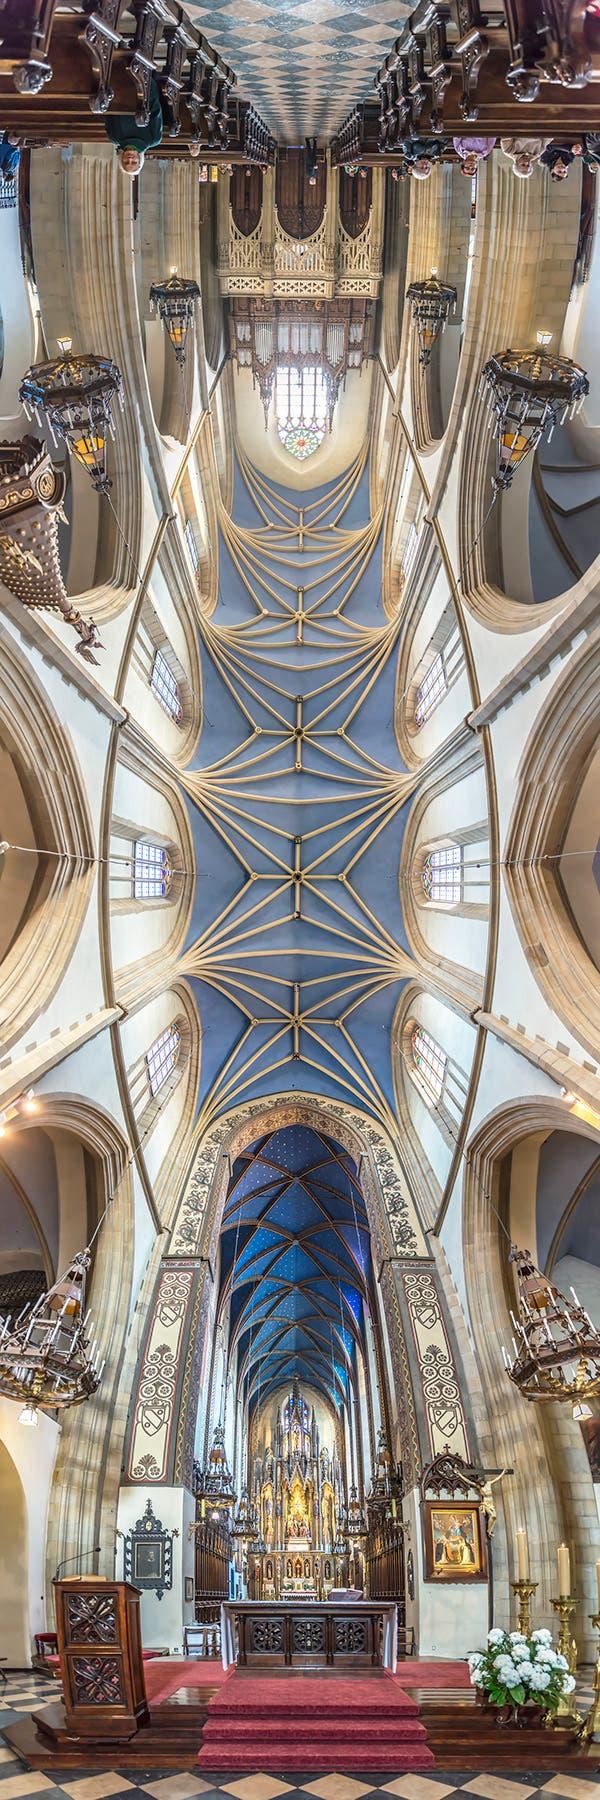 techos-de-iglesias-5